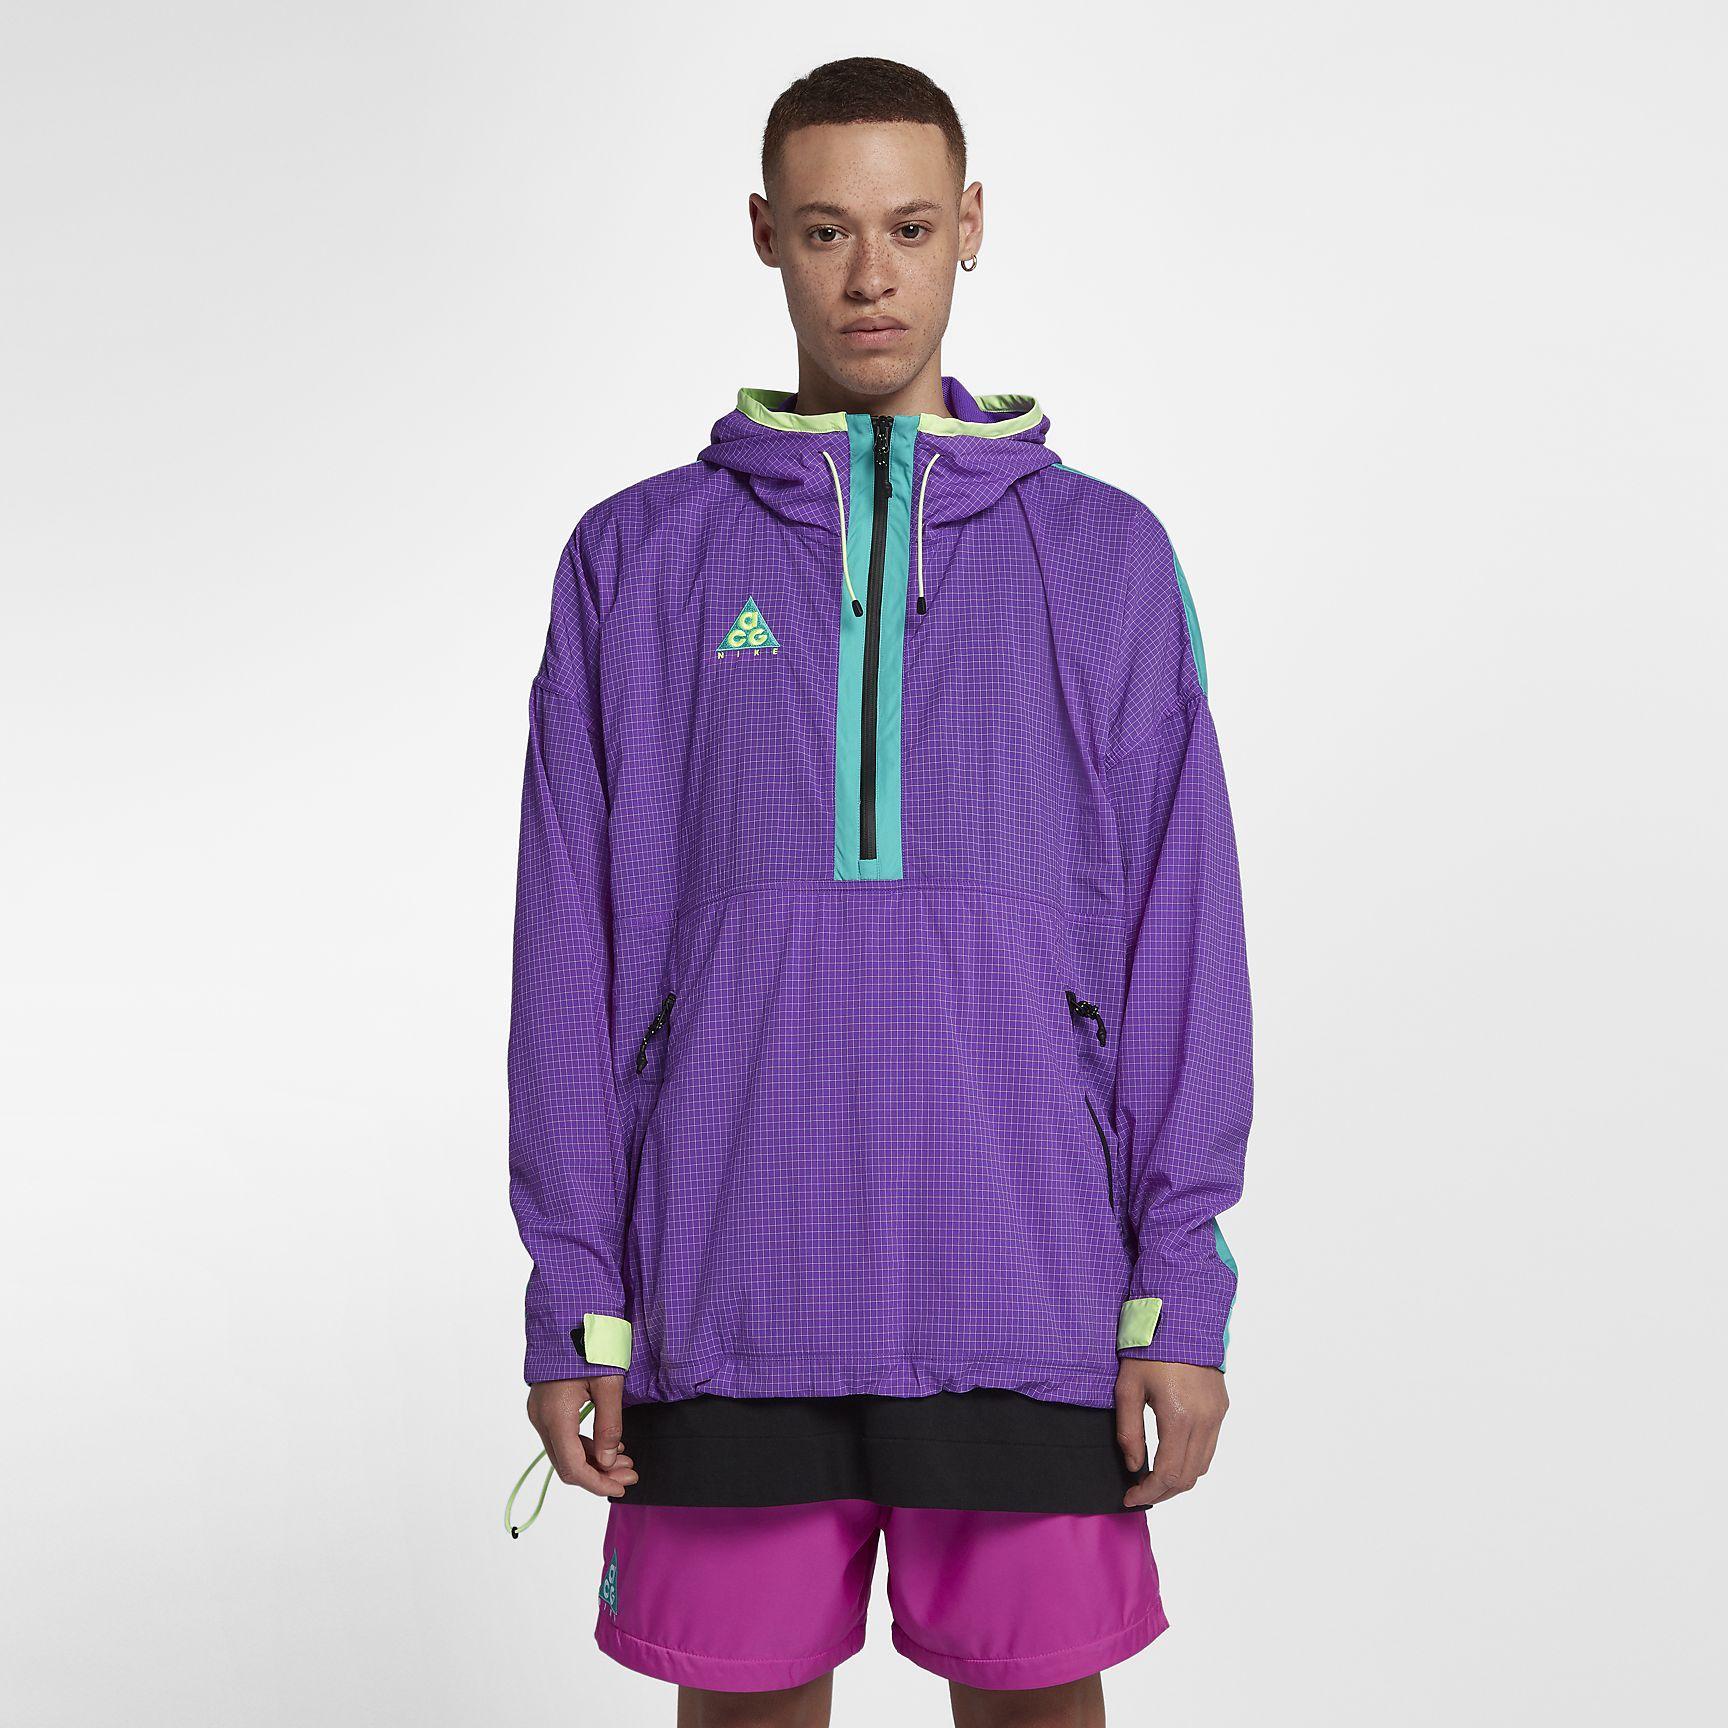 f069455192e9 Nike ACG Jacket